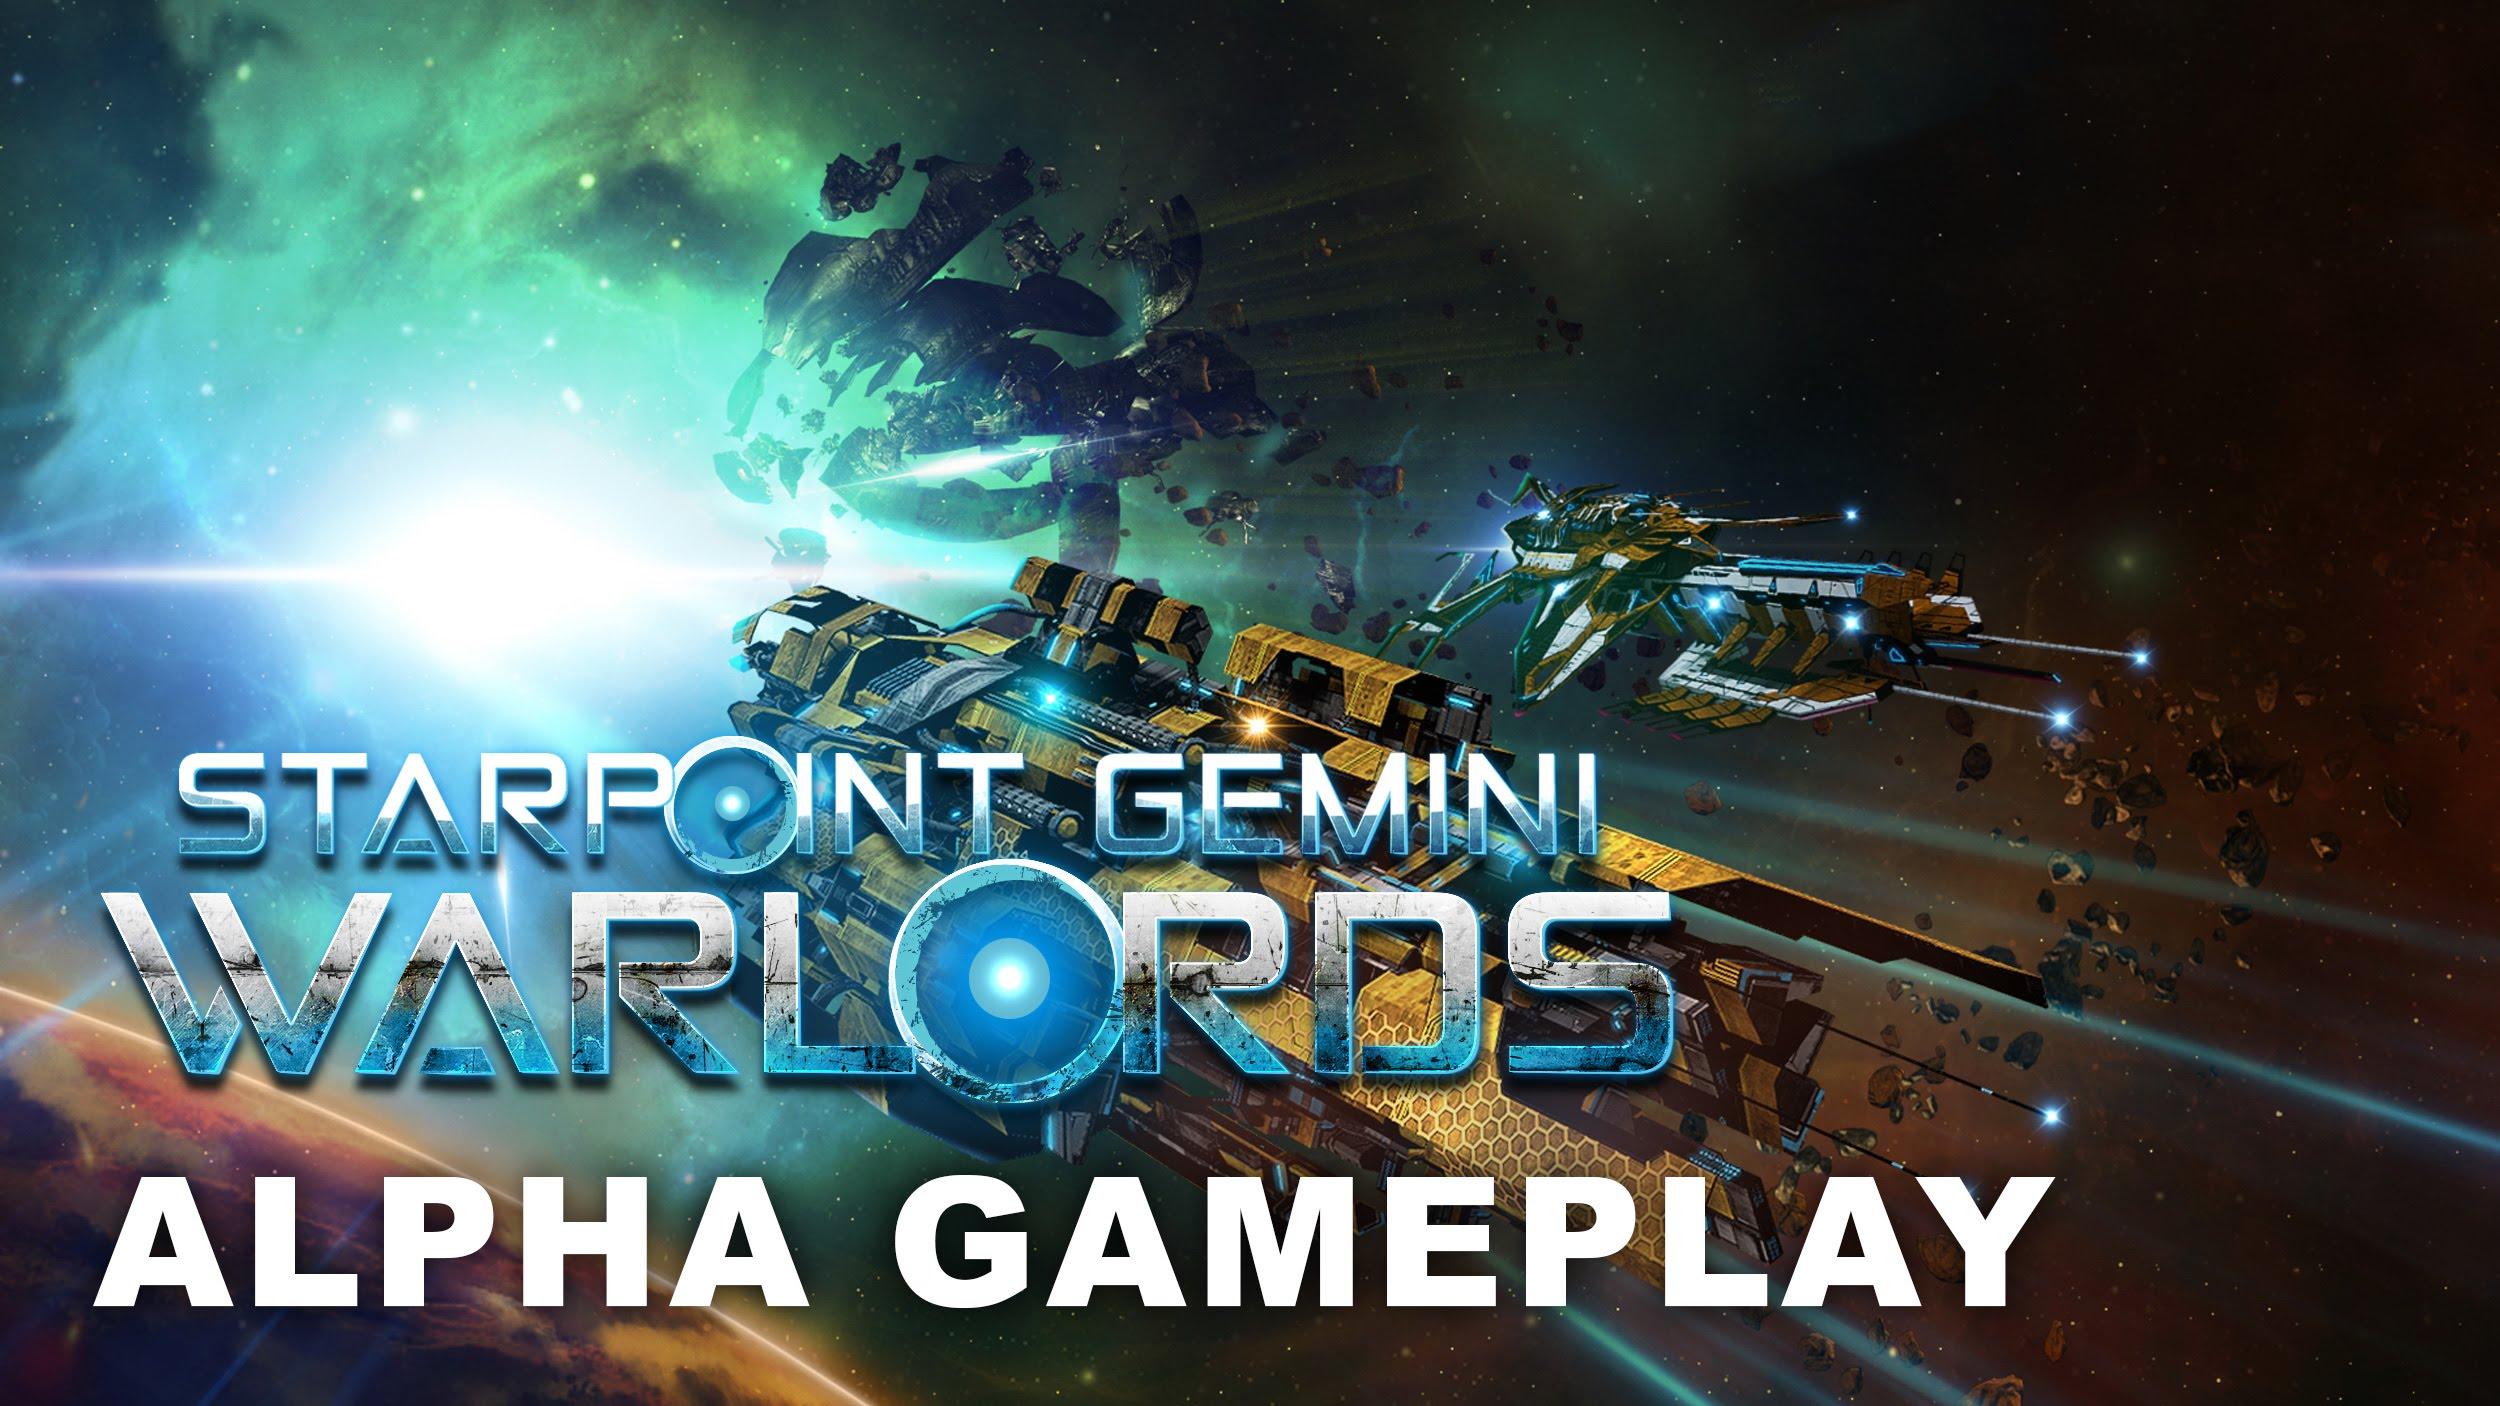 Starpoint Gemini: Warlords - Alpha Gameplay Video